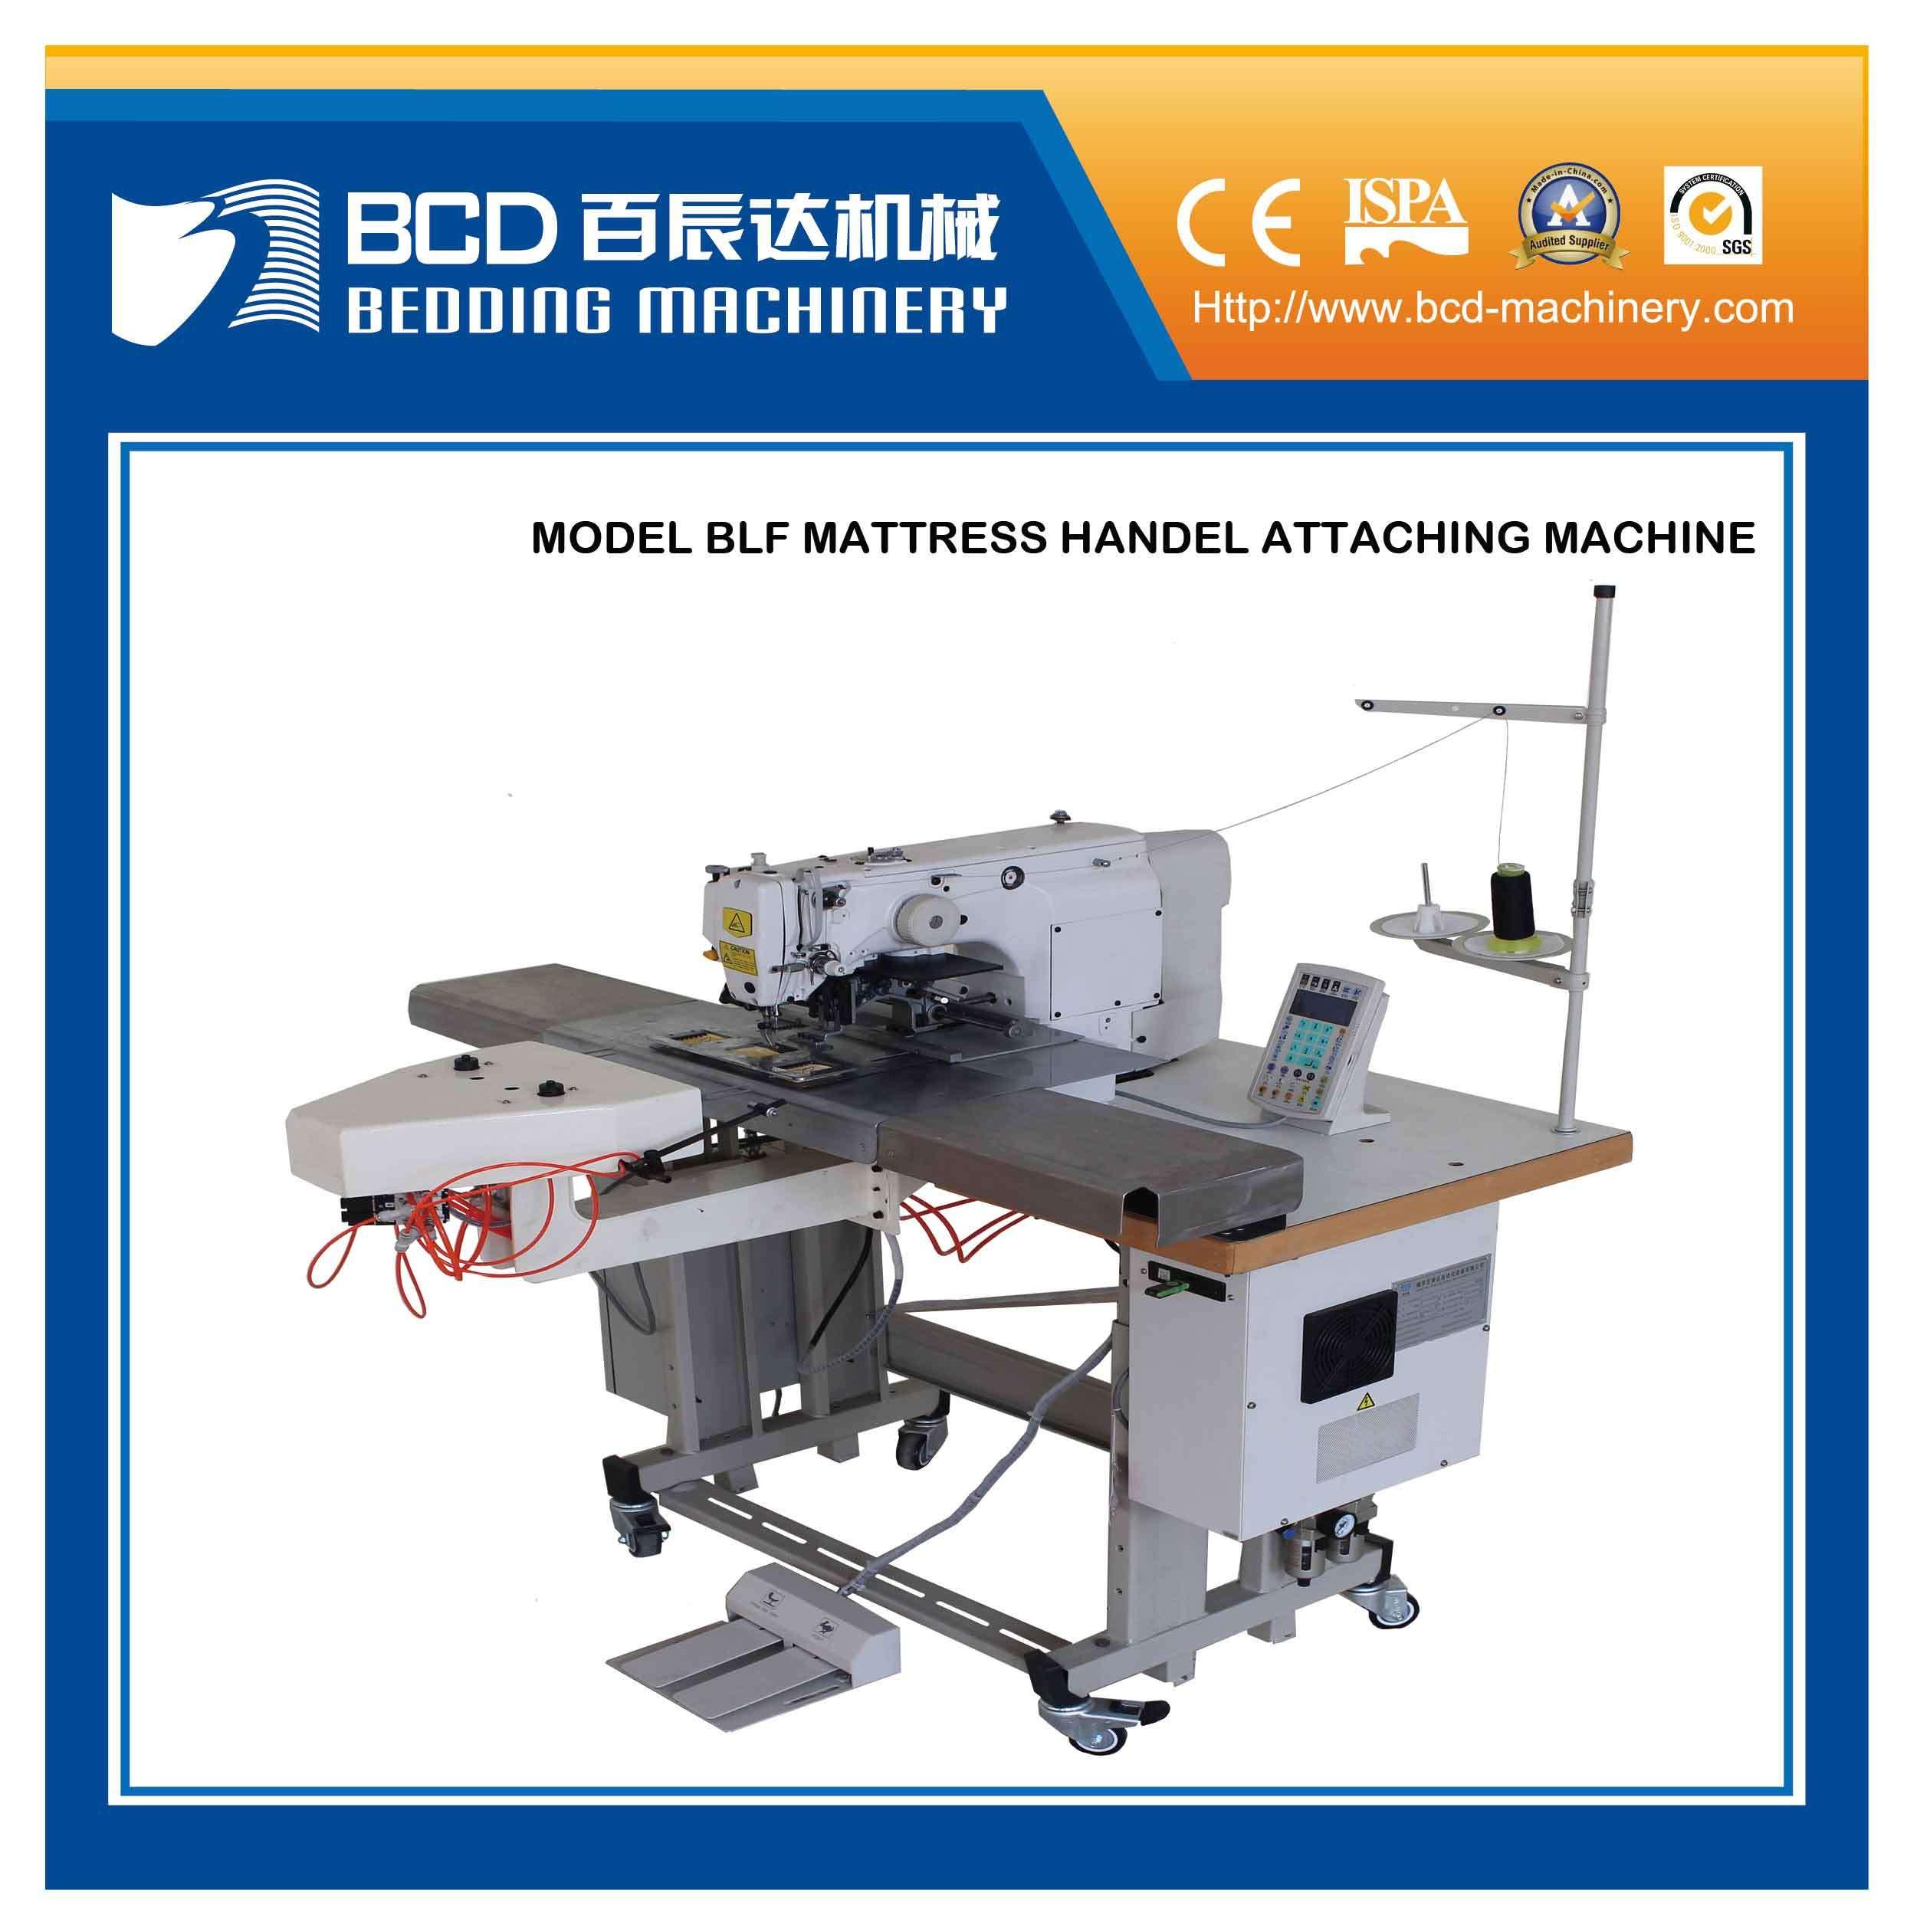 Mattress Handle Attaching Machine (BLF)